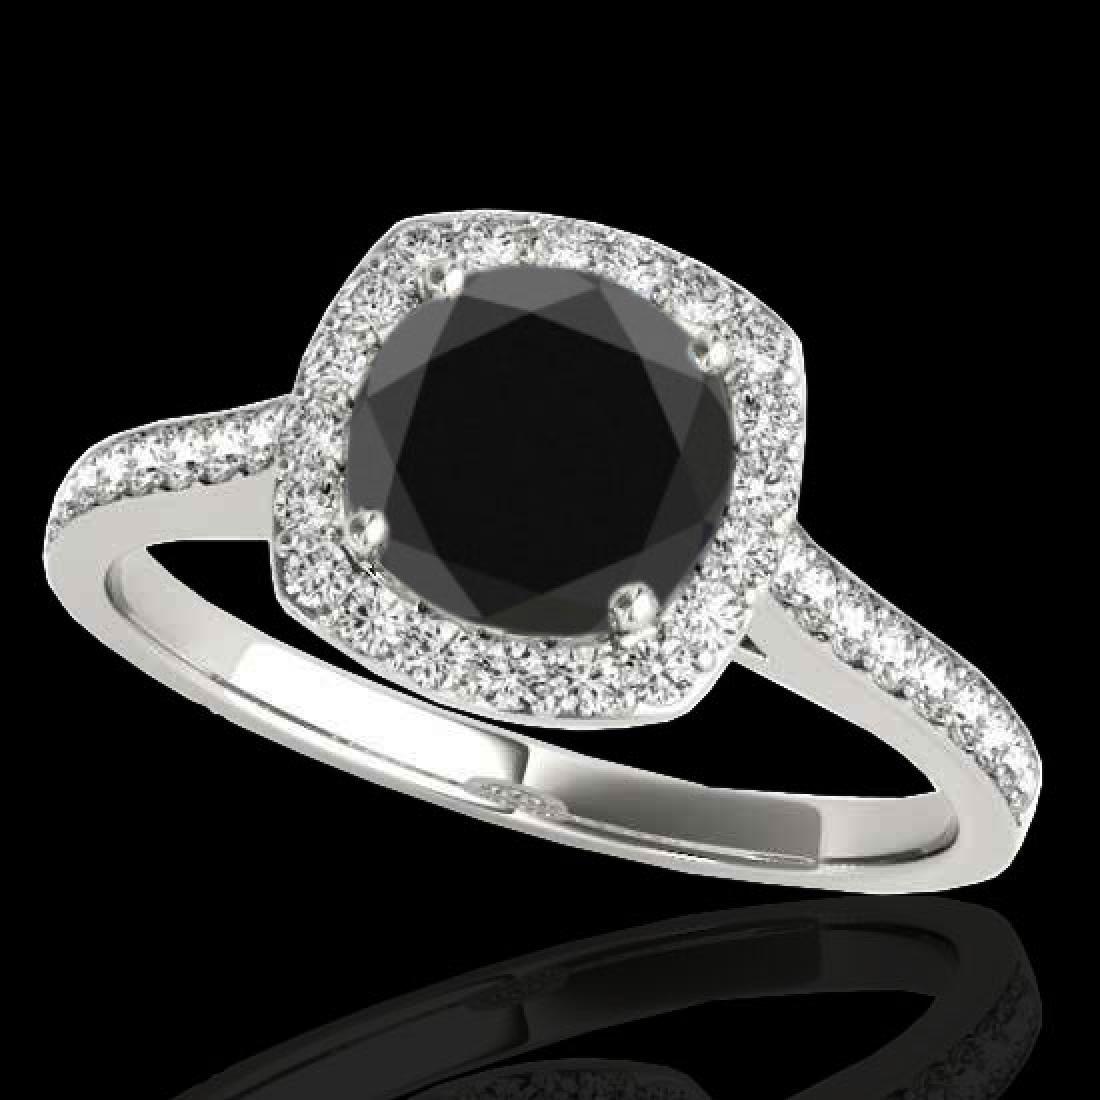 1.4 CTW Certified VS Black Diamond Solitaire Halo Ring